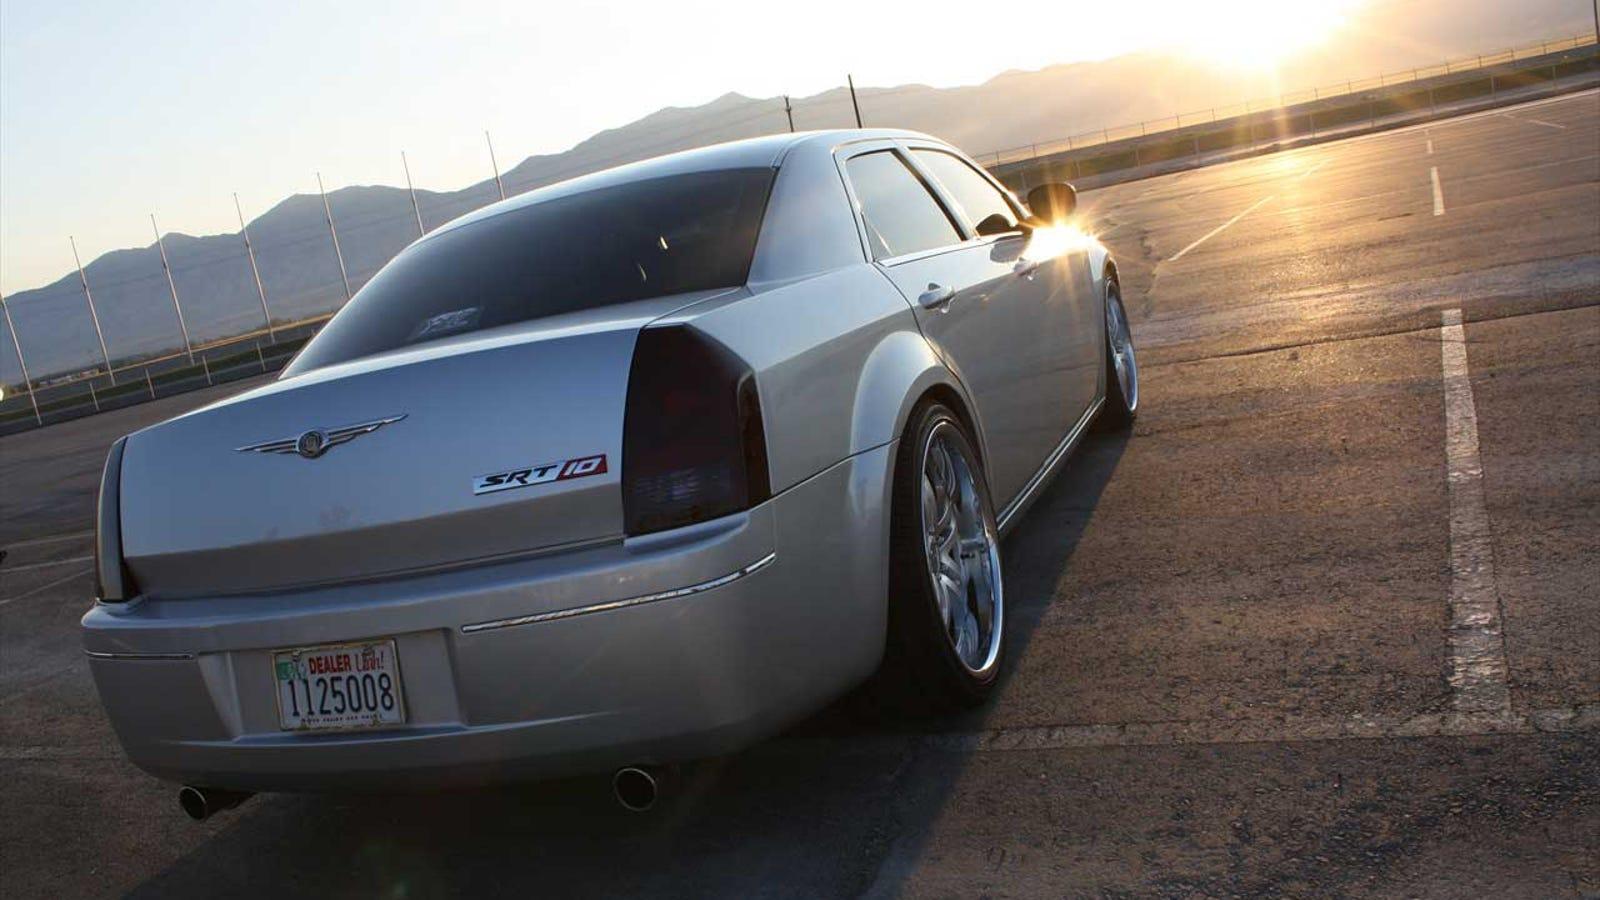 The Real Story Behind Viper Engined Chrysler 300 Srt10 Dodge V10 Wiring Harness